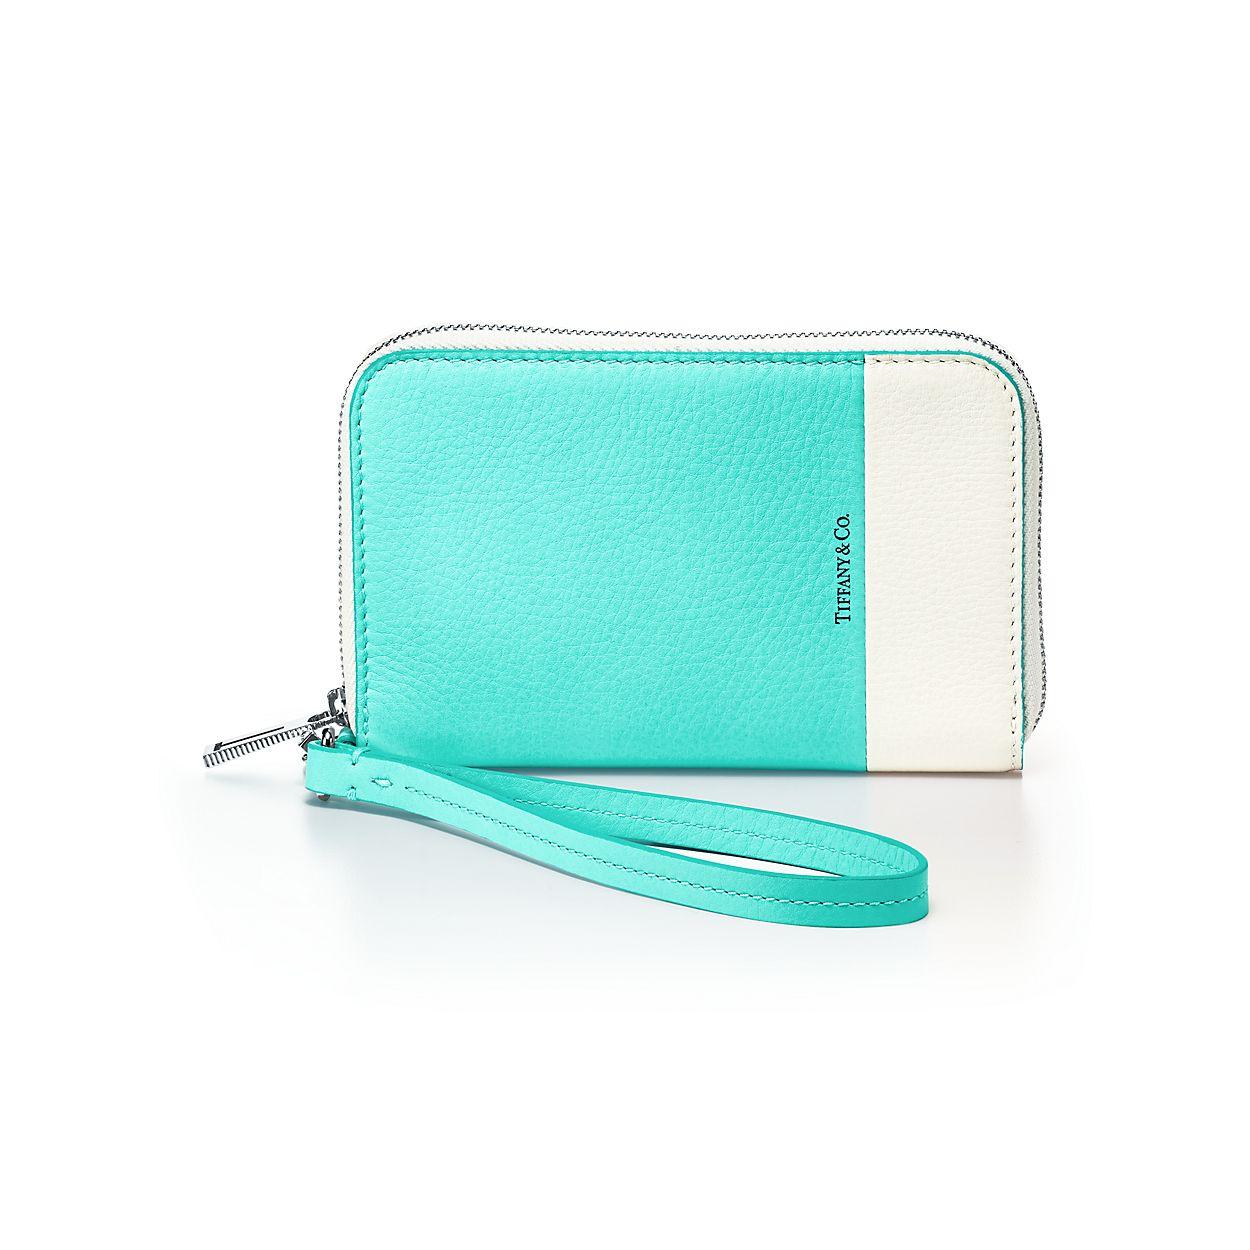 Clé Bijou De Sac En Cuir Vachette Fleur Bleu Tiffany & Co. bON79hDk